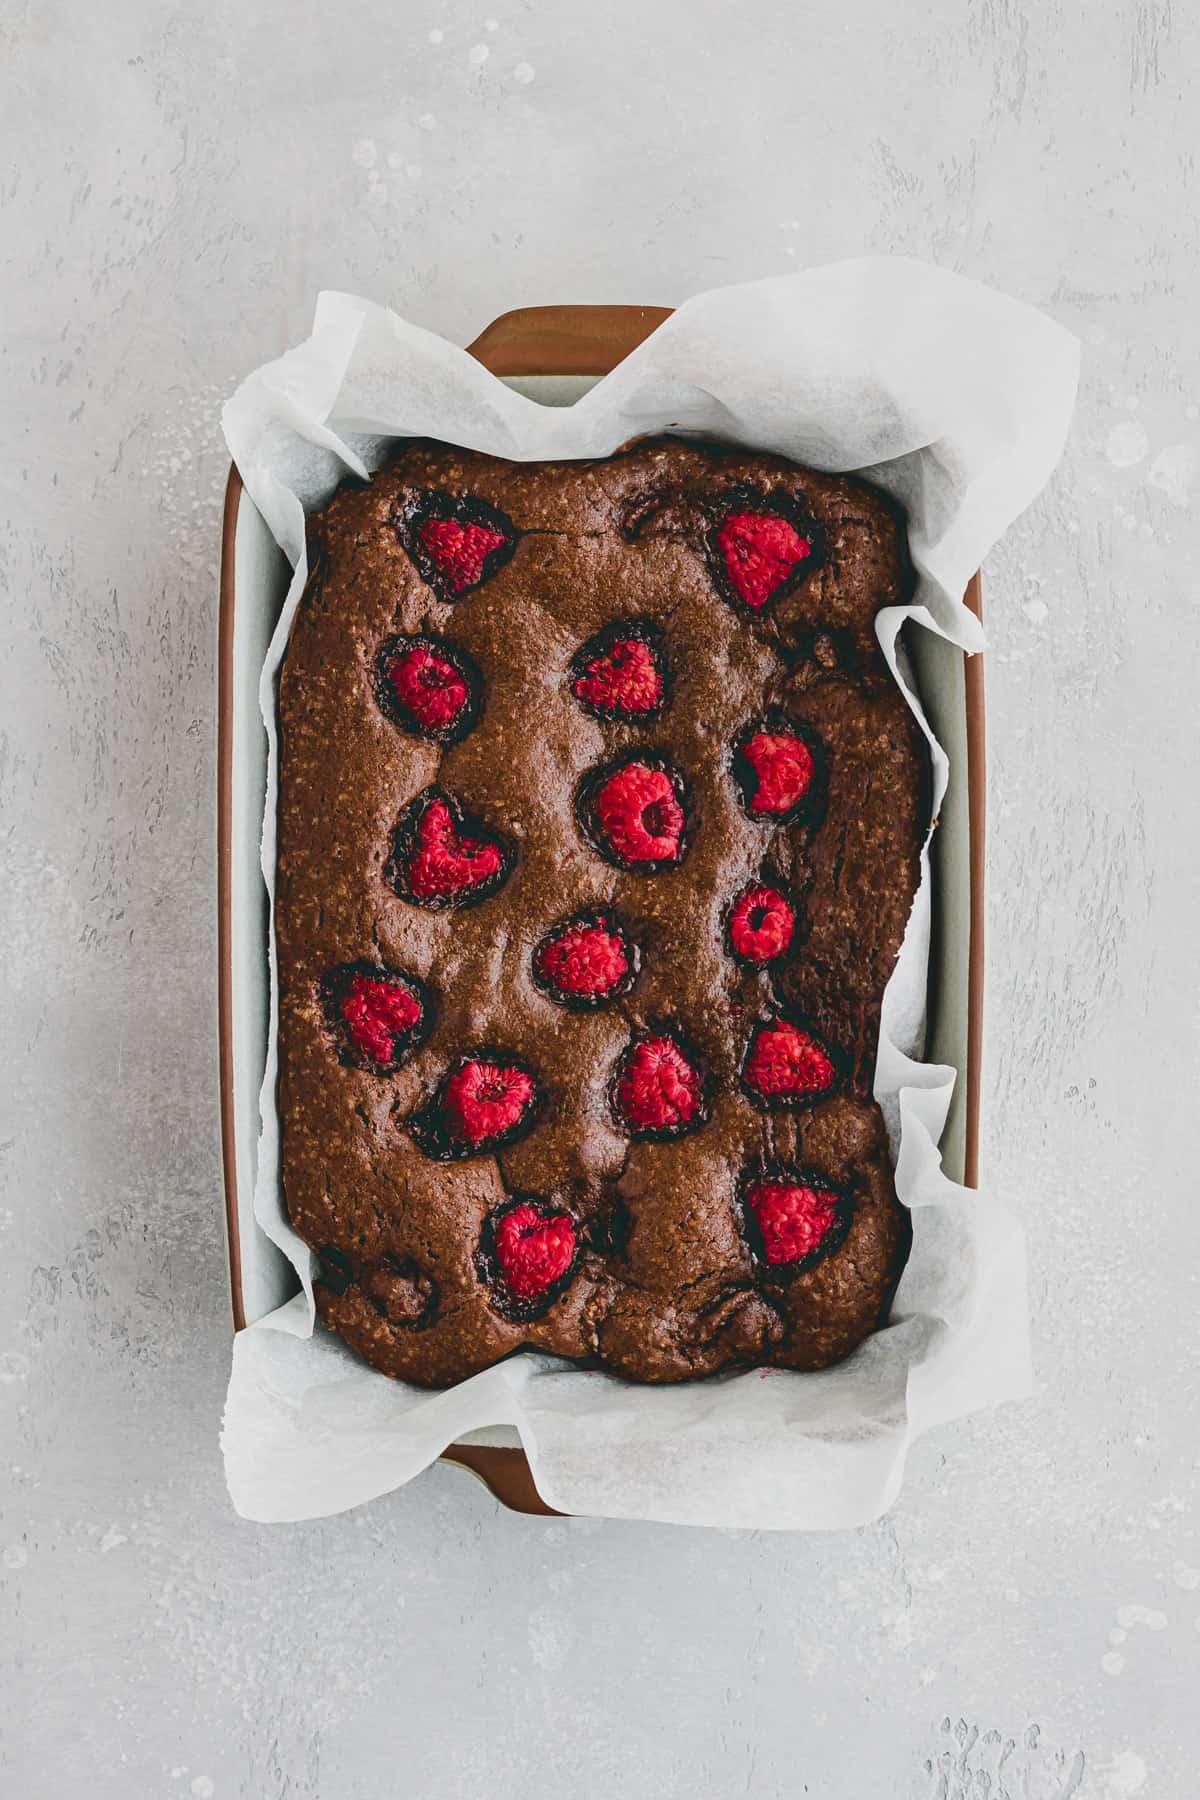 chocolate raspberry brownies in a baking pan